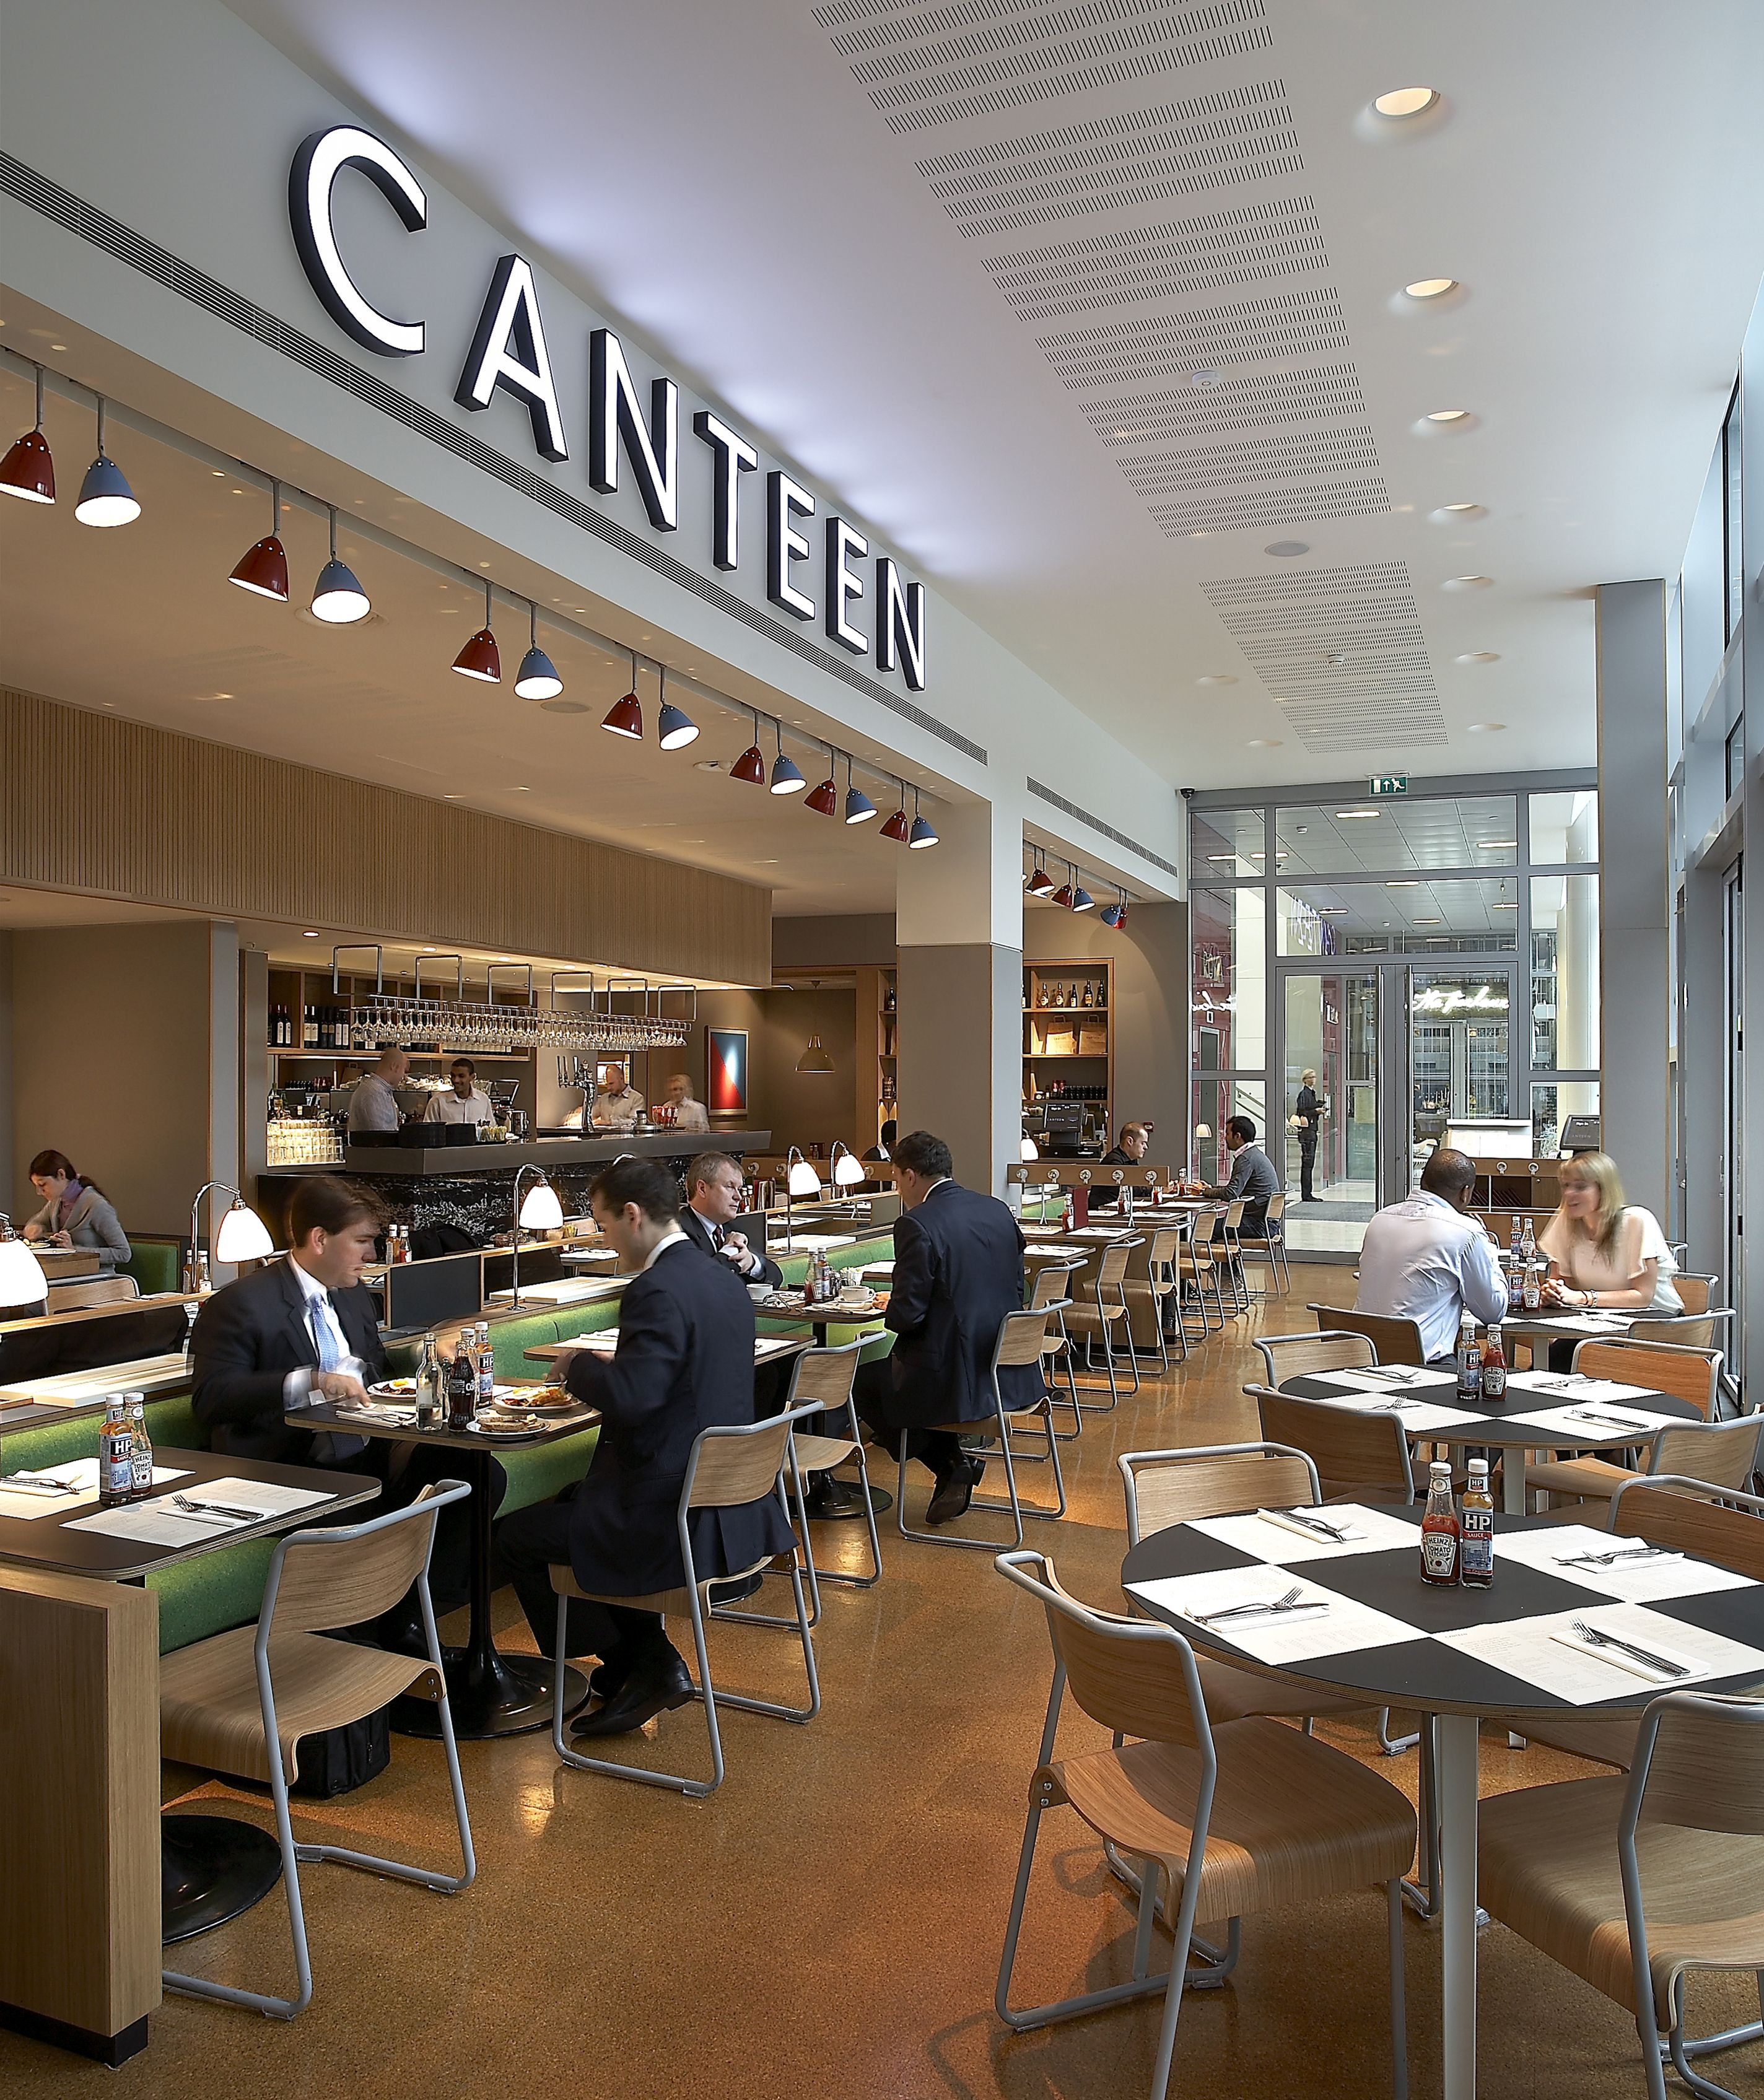 Canteen london by wells mackereth architects restaurant